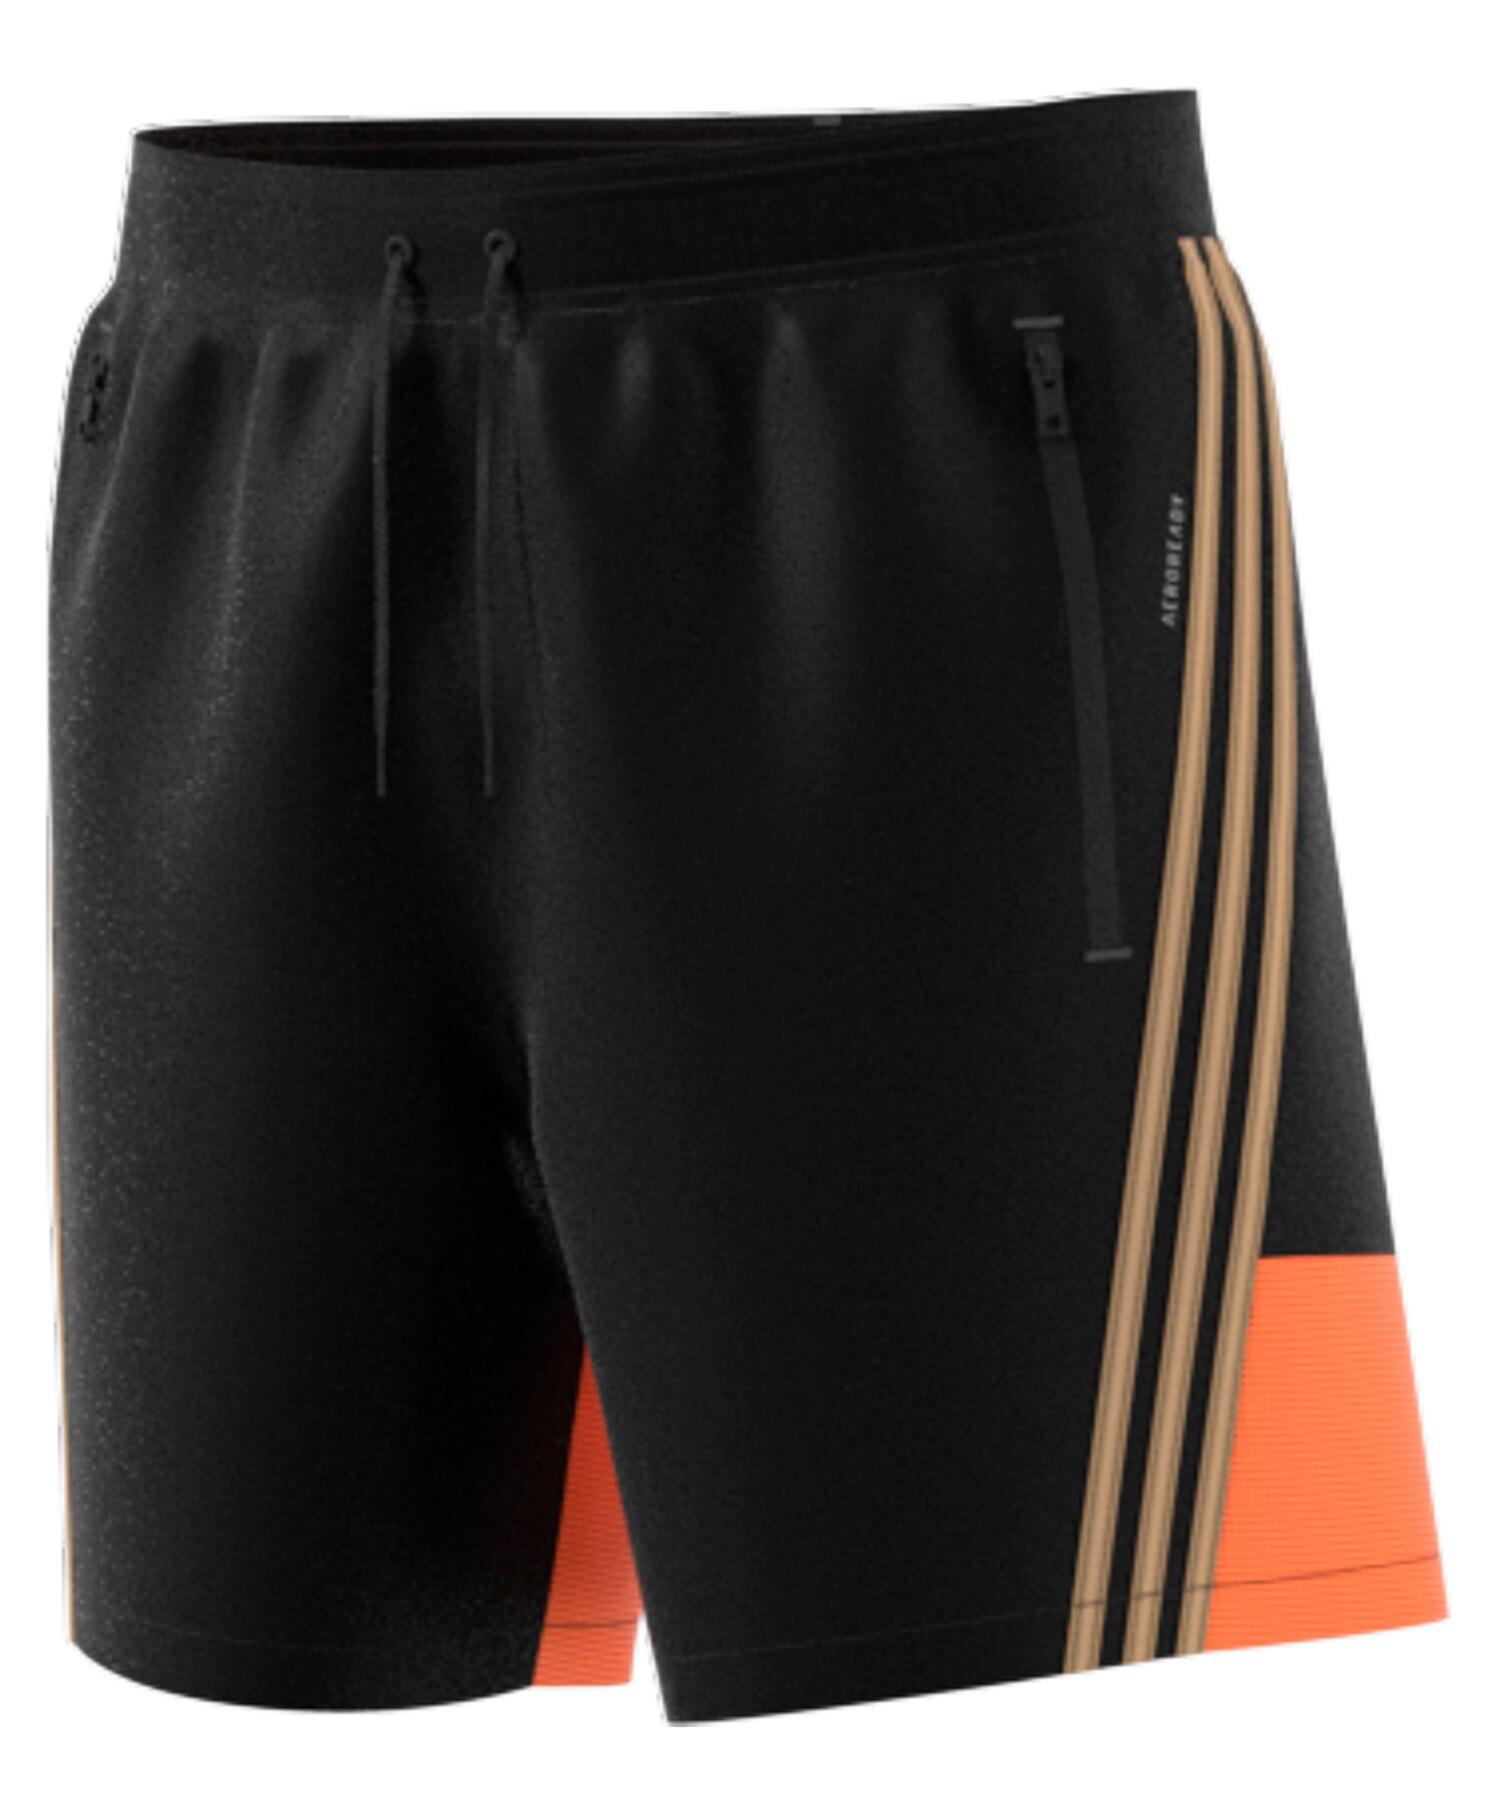 adidas m fi shorts